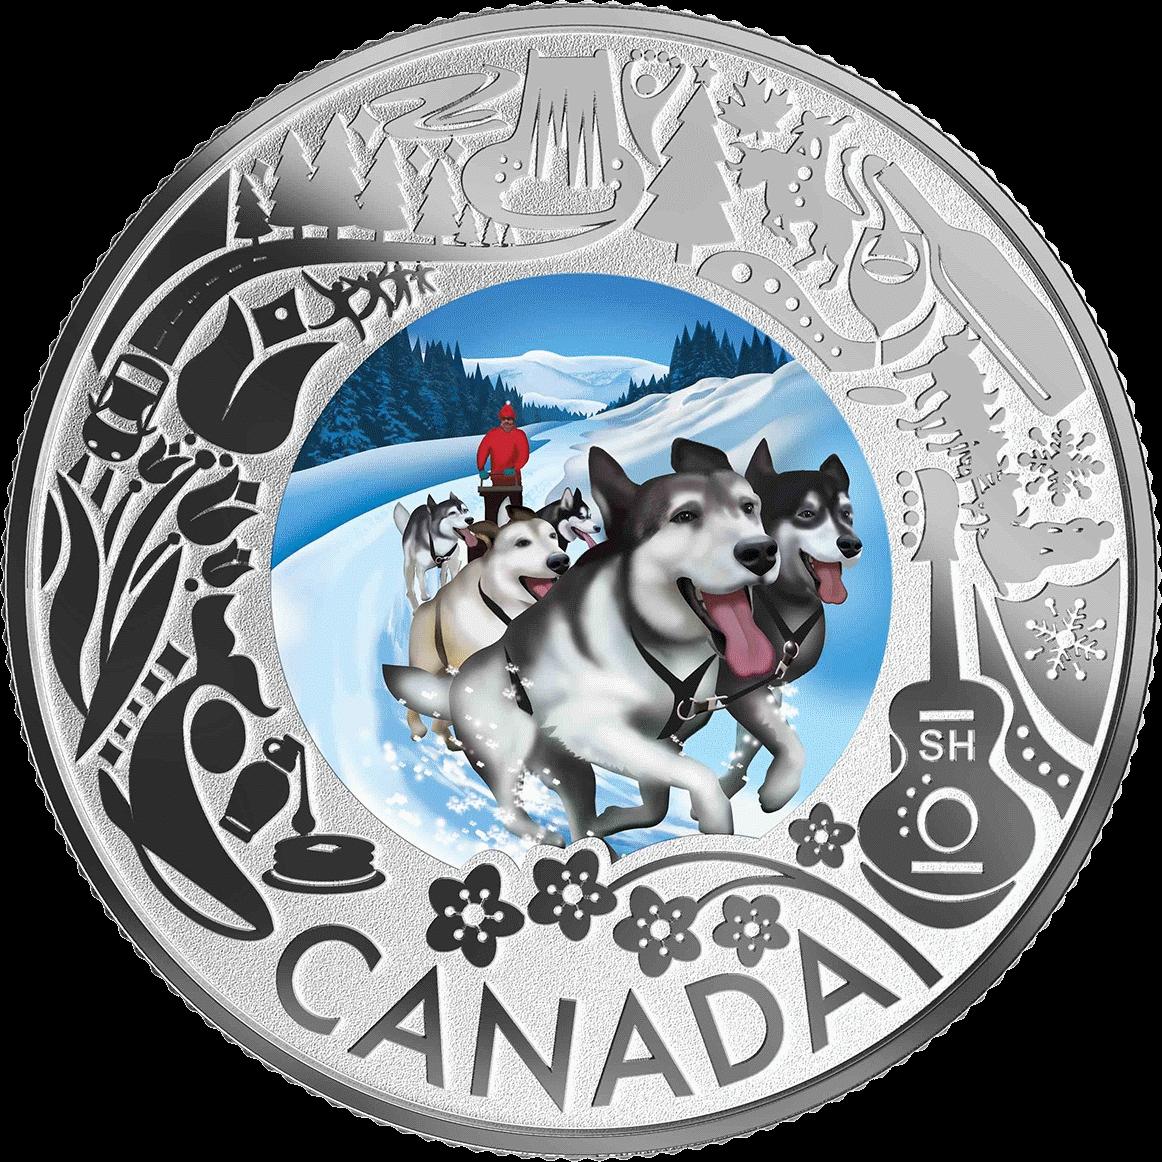 Канада монета 3 доллара Катание на собачьих упряжках, реверс